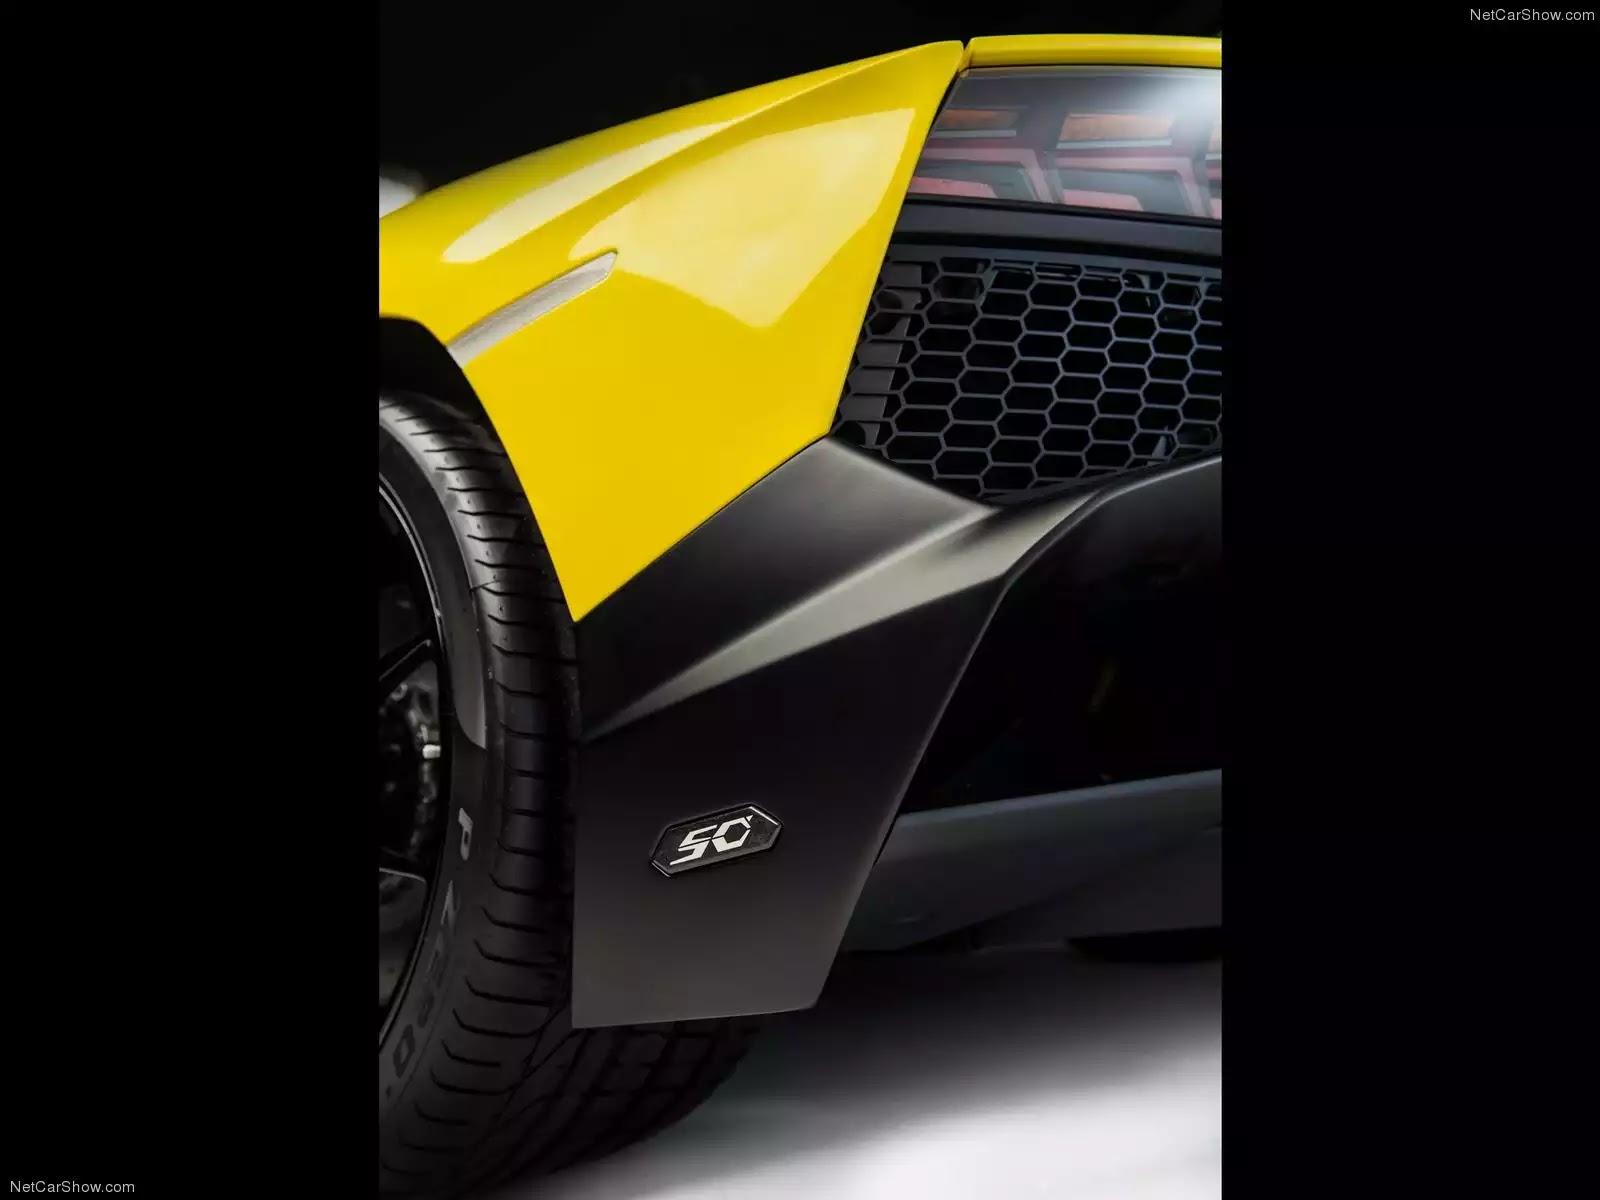 Hình ảnh siêu xe Lamborghini Aventador LP720-4 50th Anniversary 2013 & nội ngoại thất